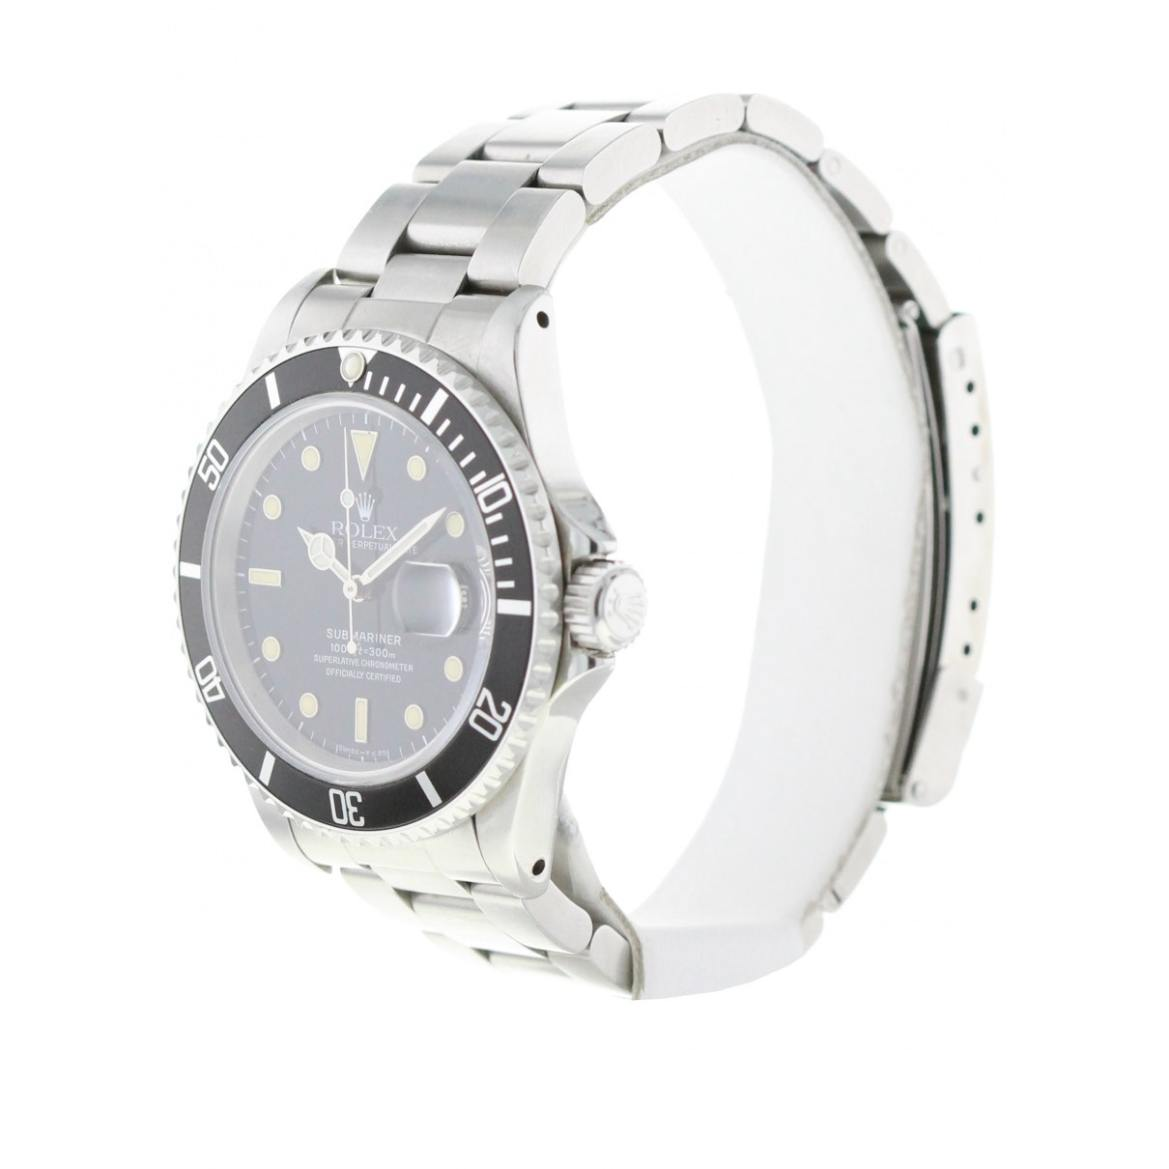 rolex-submariner-vintage-couronne-profil